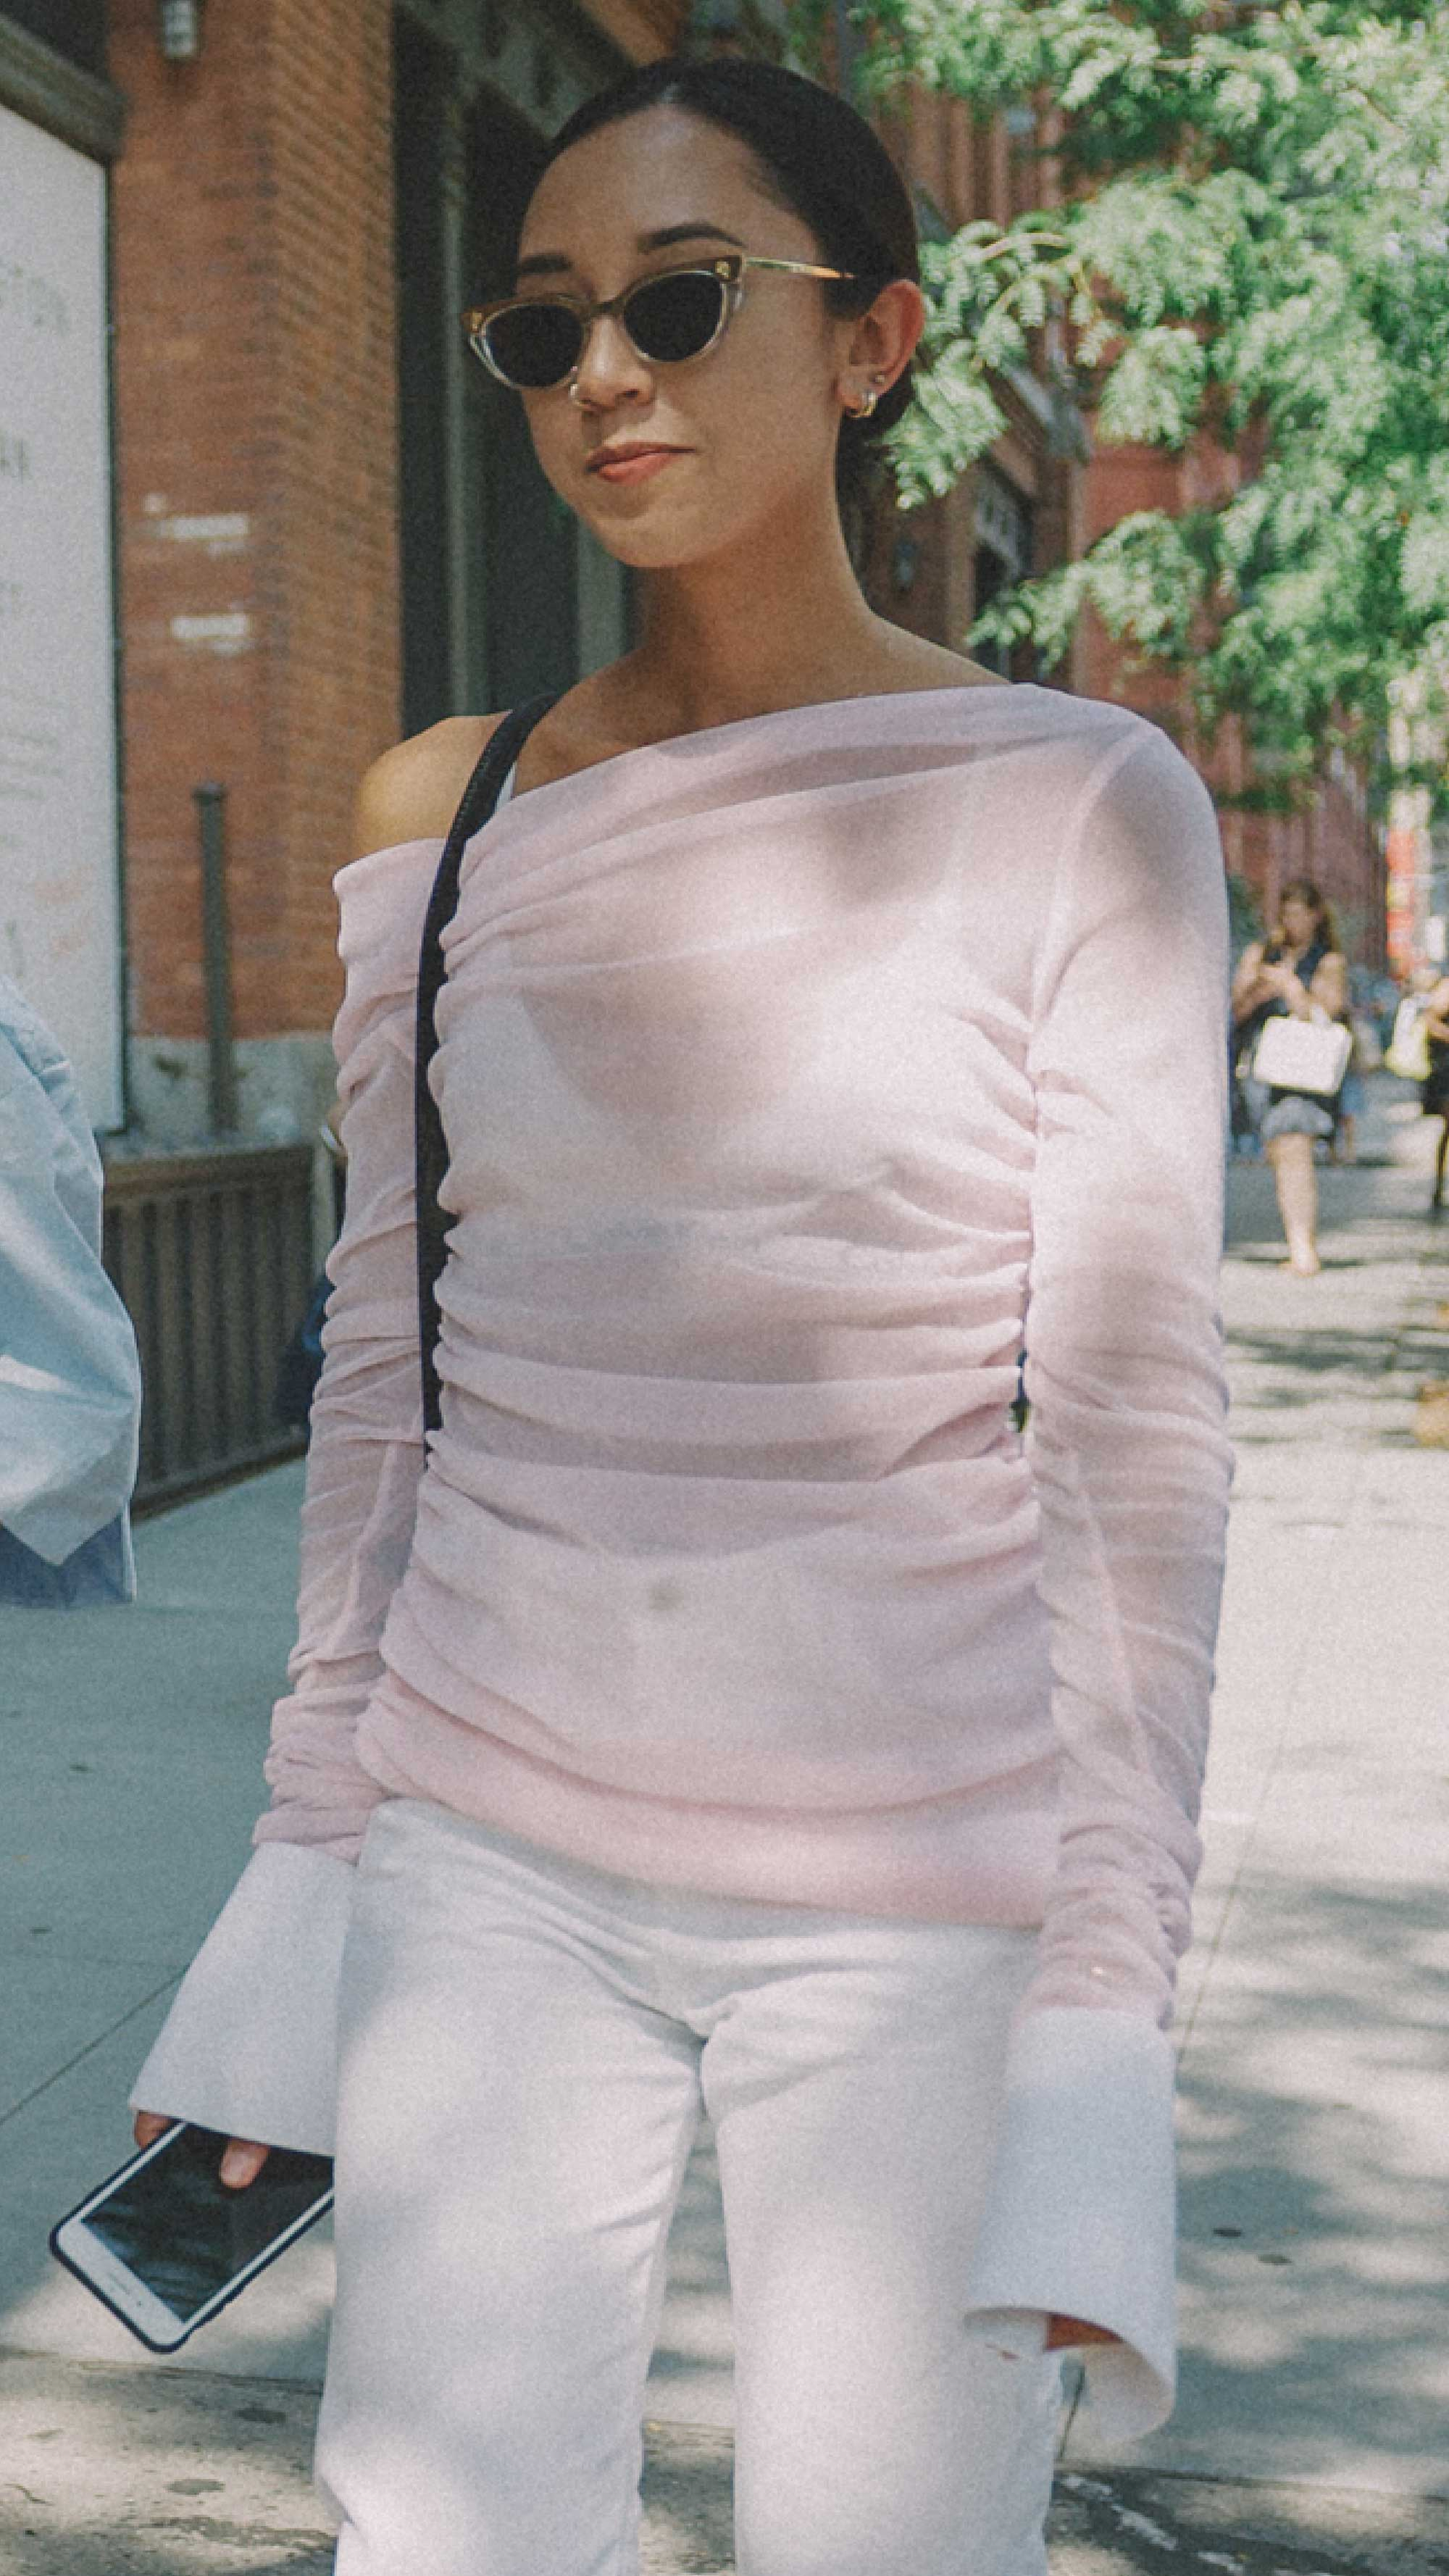 New-York-Fashion-Week-NYFW-SS18-street-style-day-one6.jpg